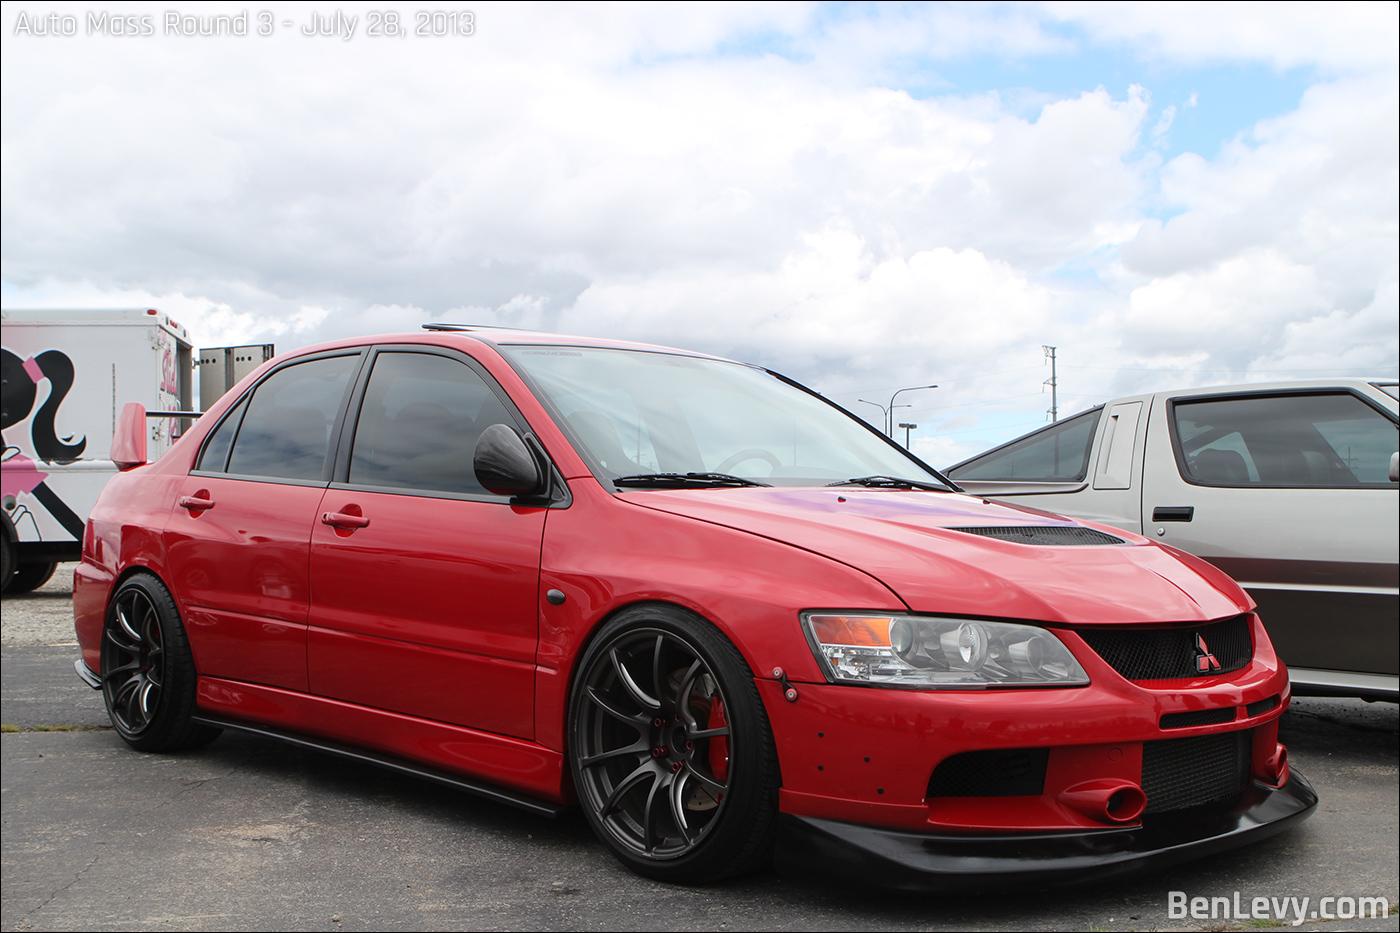 Red Lancer Evo